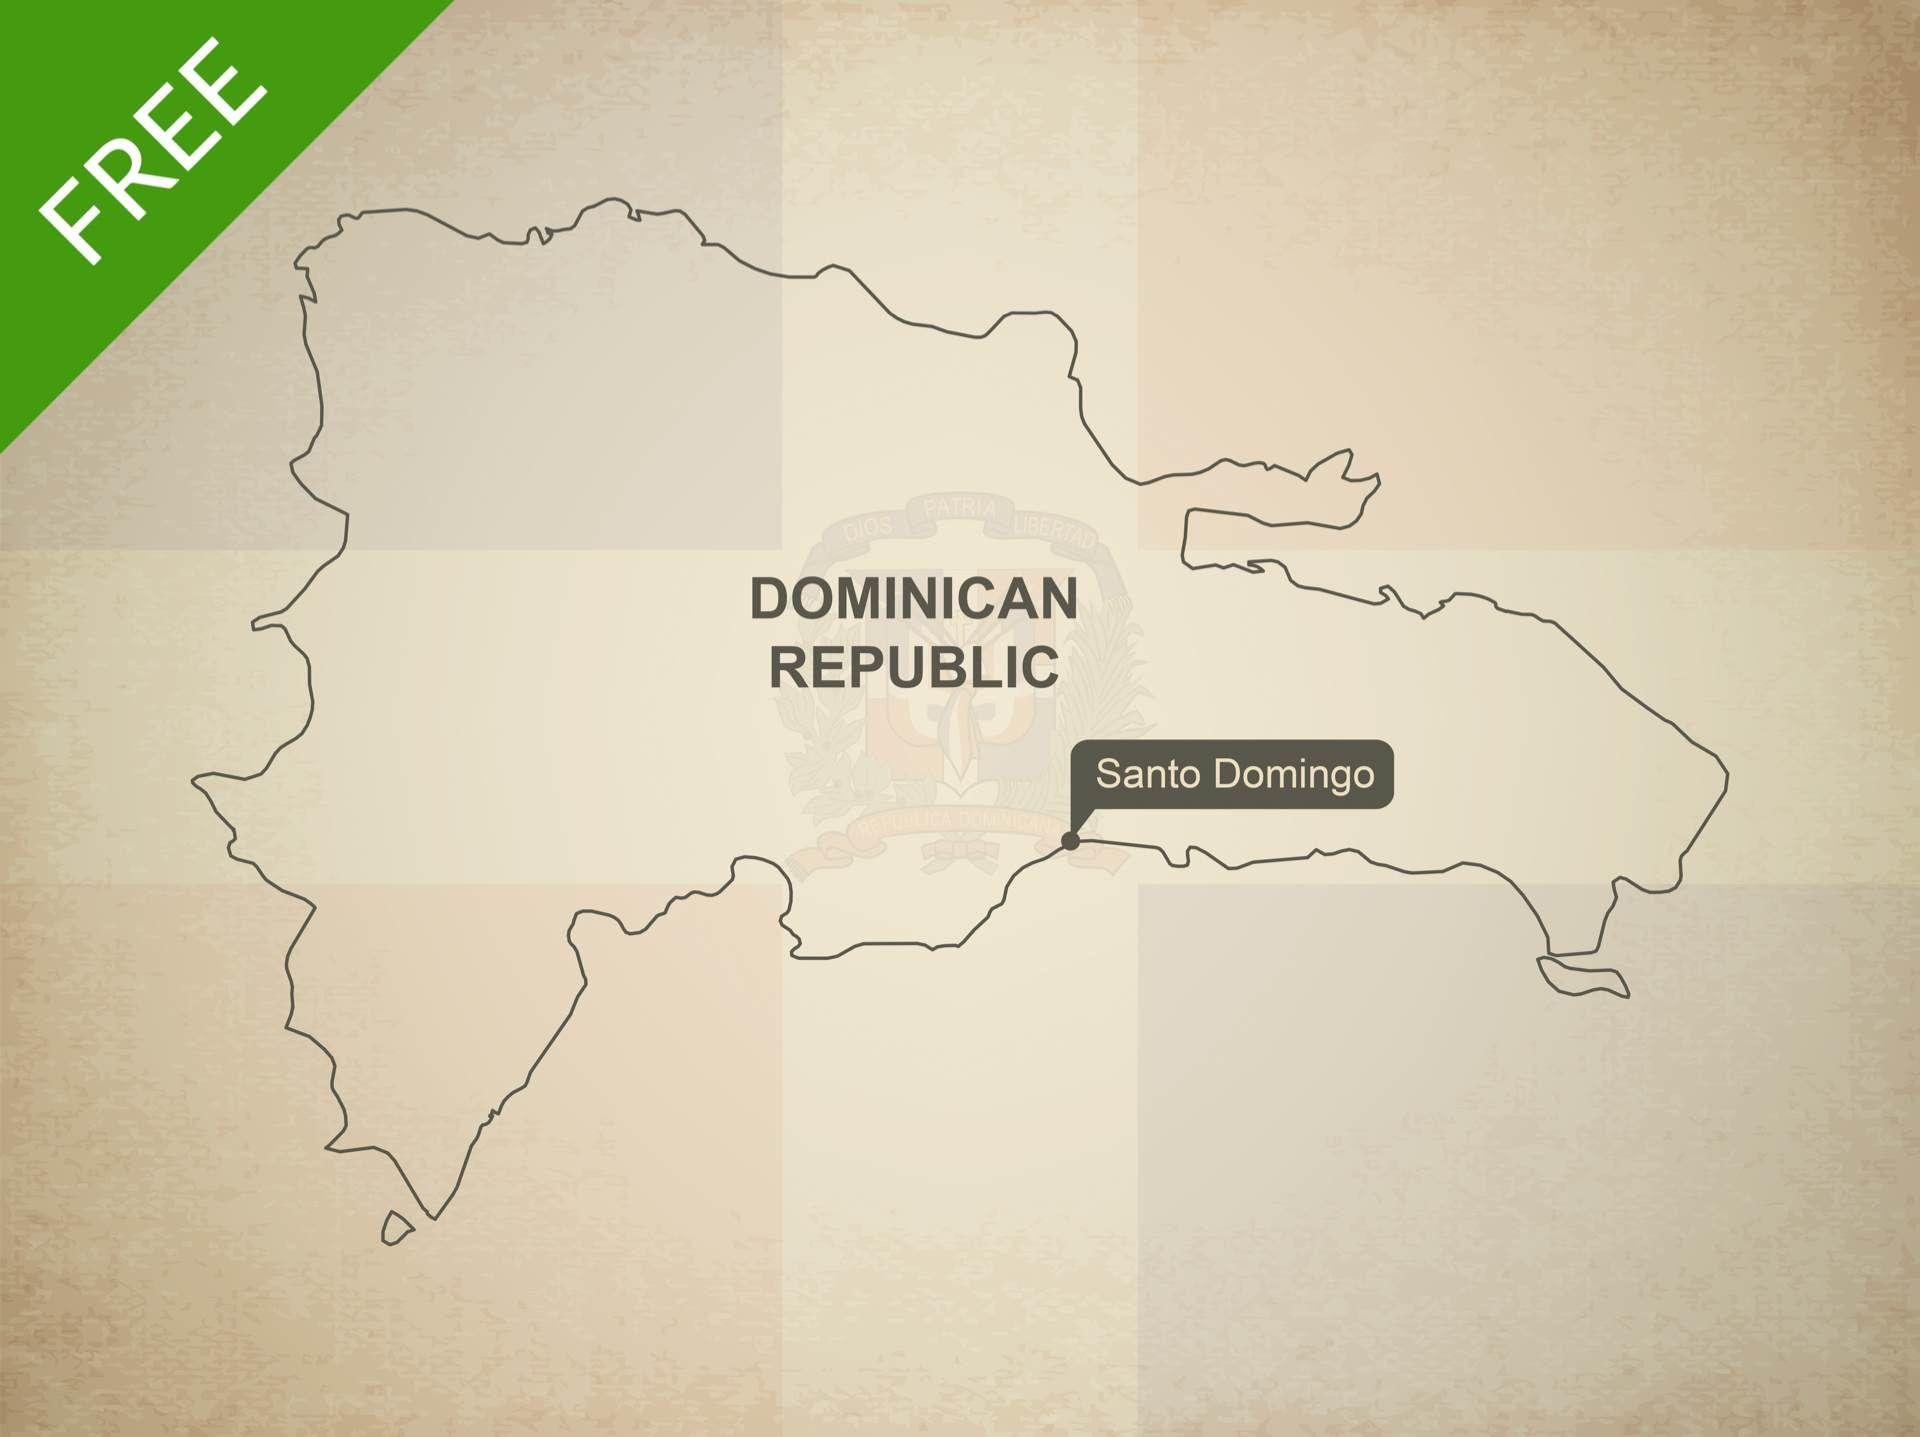 Free Vector Map of Dominican Republic Dominican republic